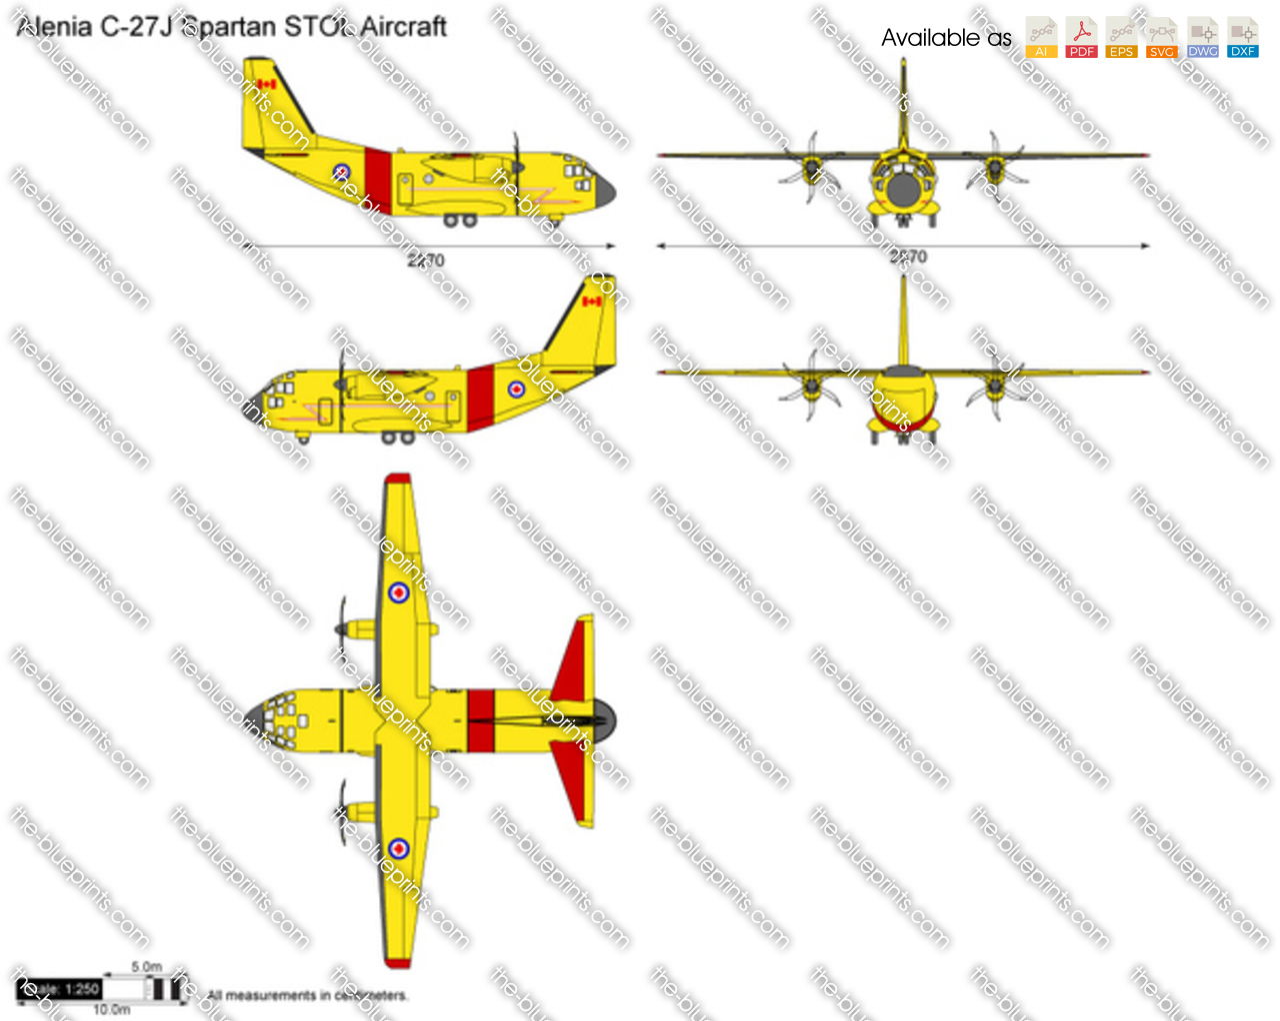 Alenia C-27J Spartan STOL Aircraft